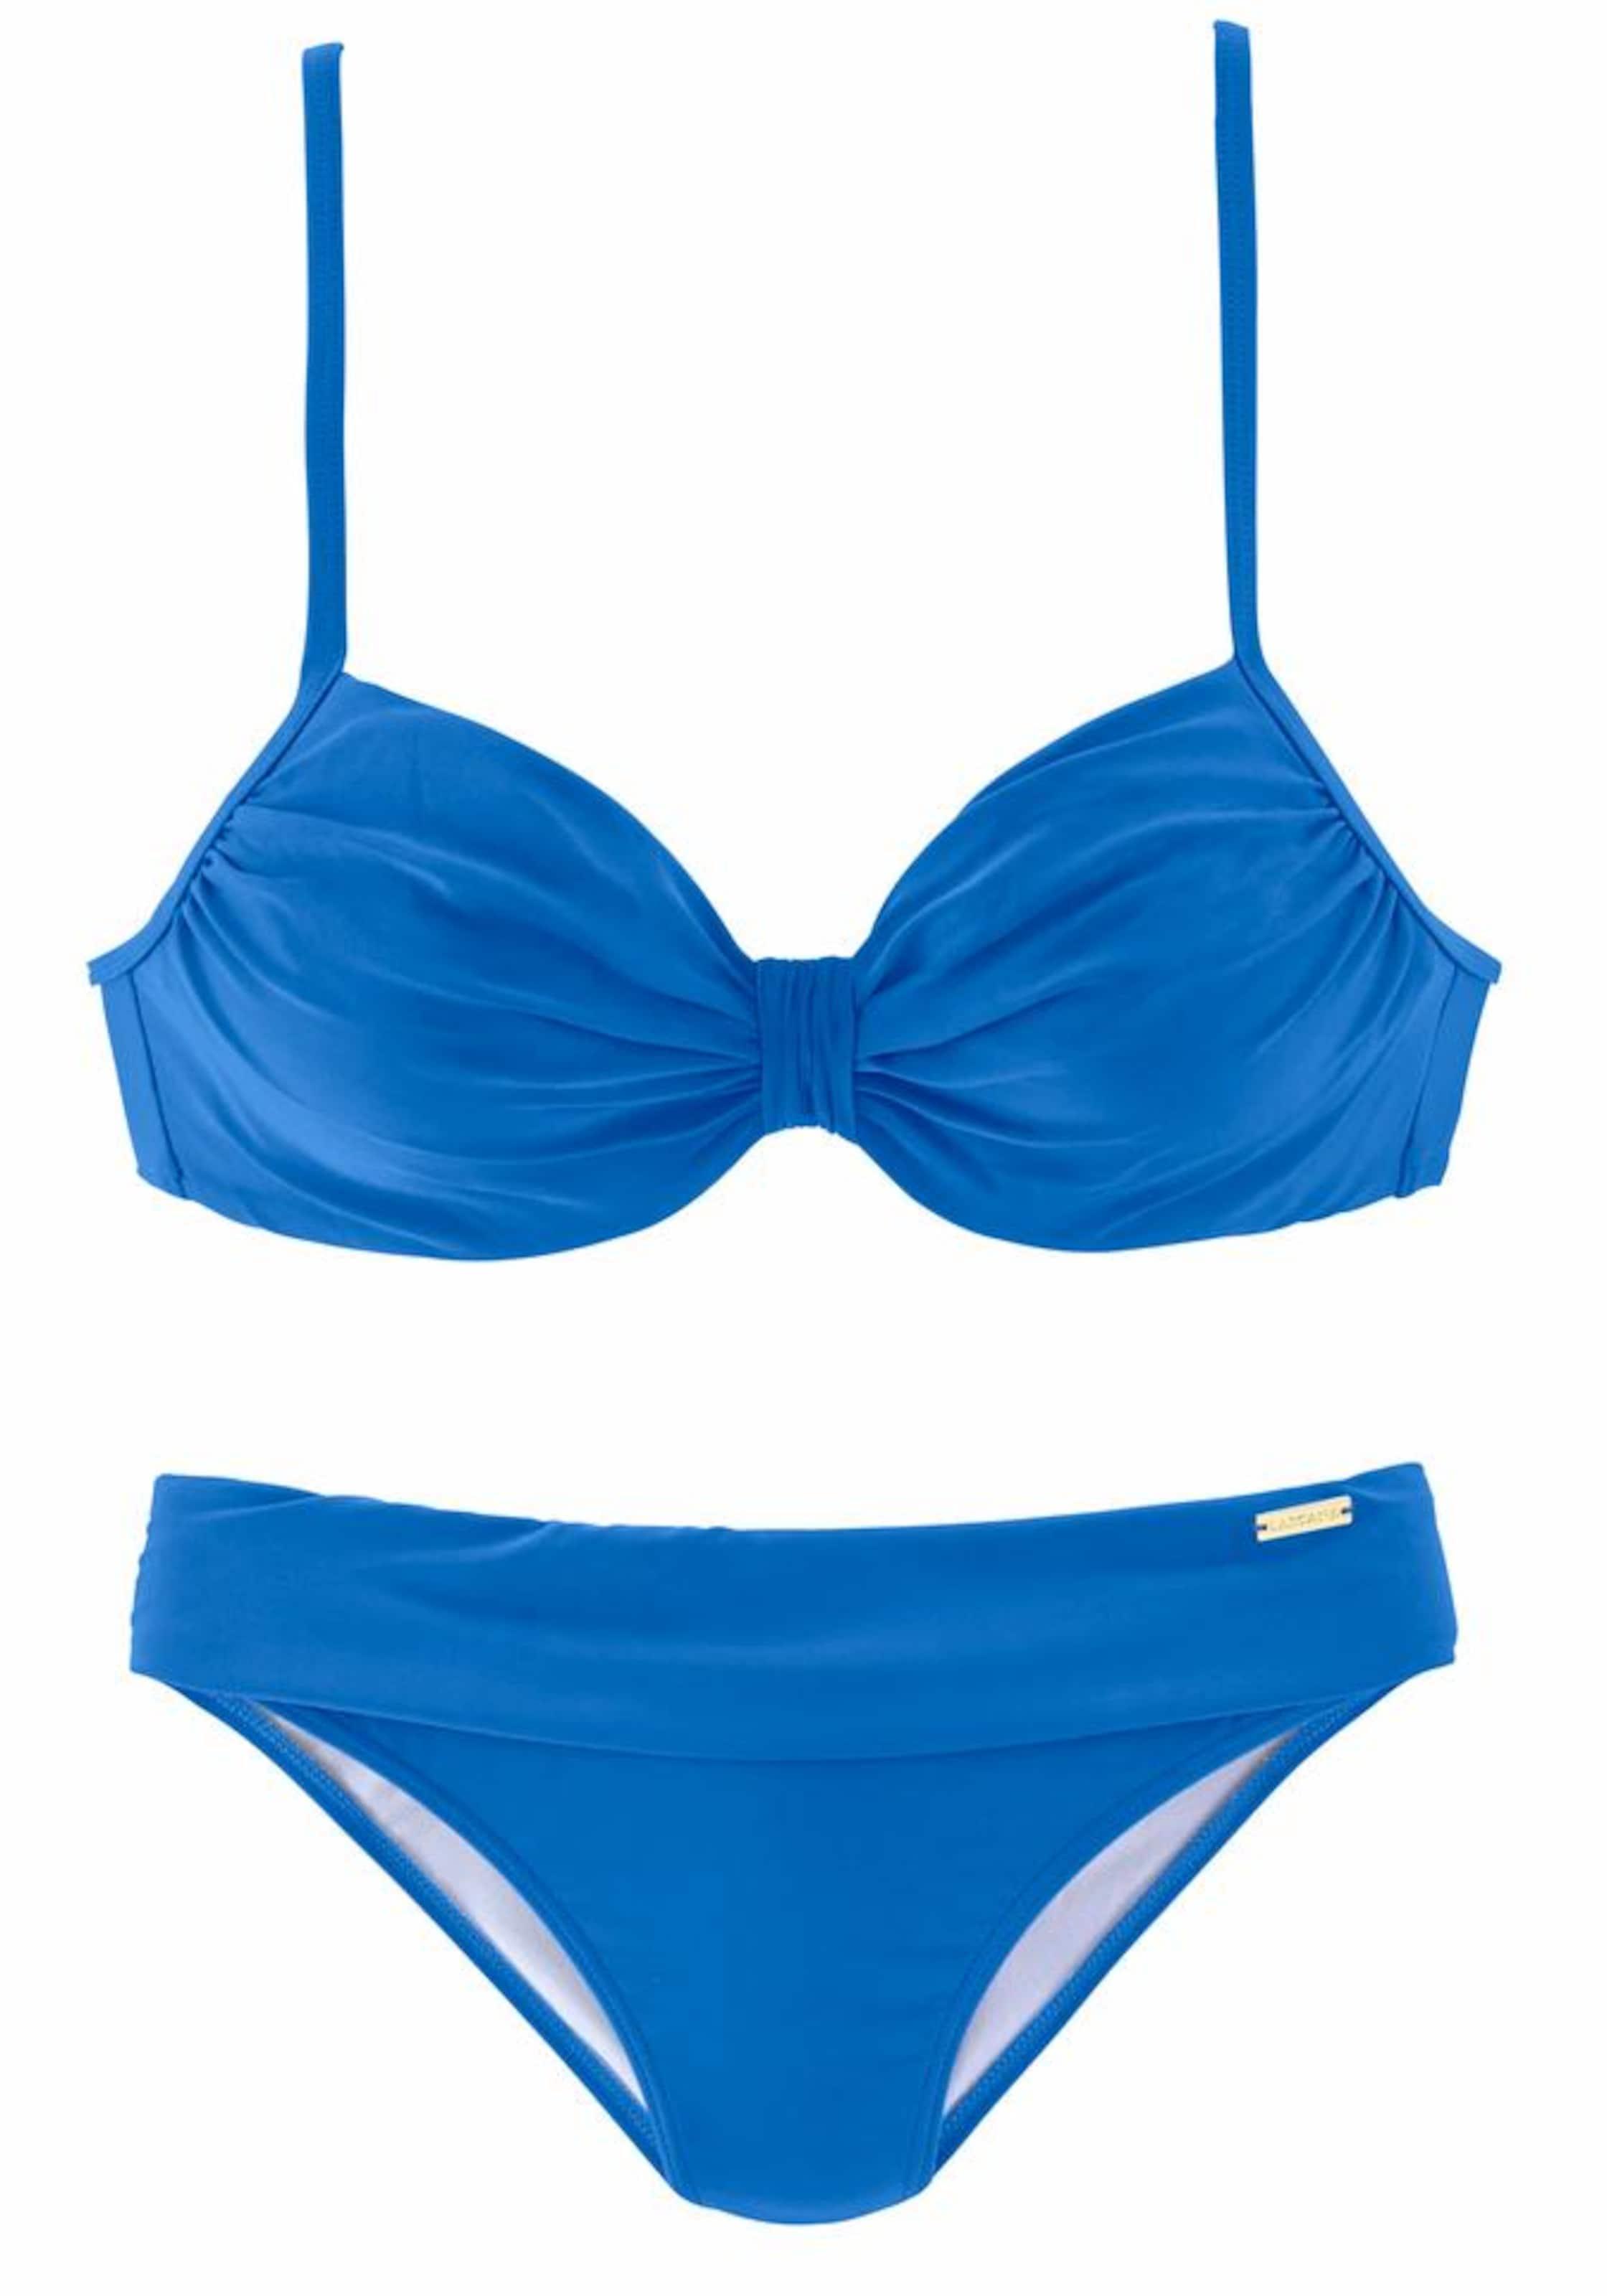 Bikini In Lascana Lascana Blau Bikini Blau Lascana Bikini In deBorCx